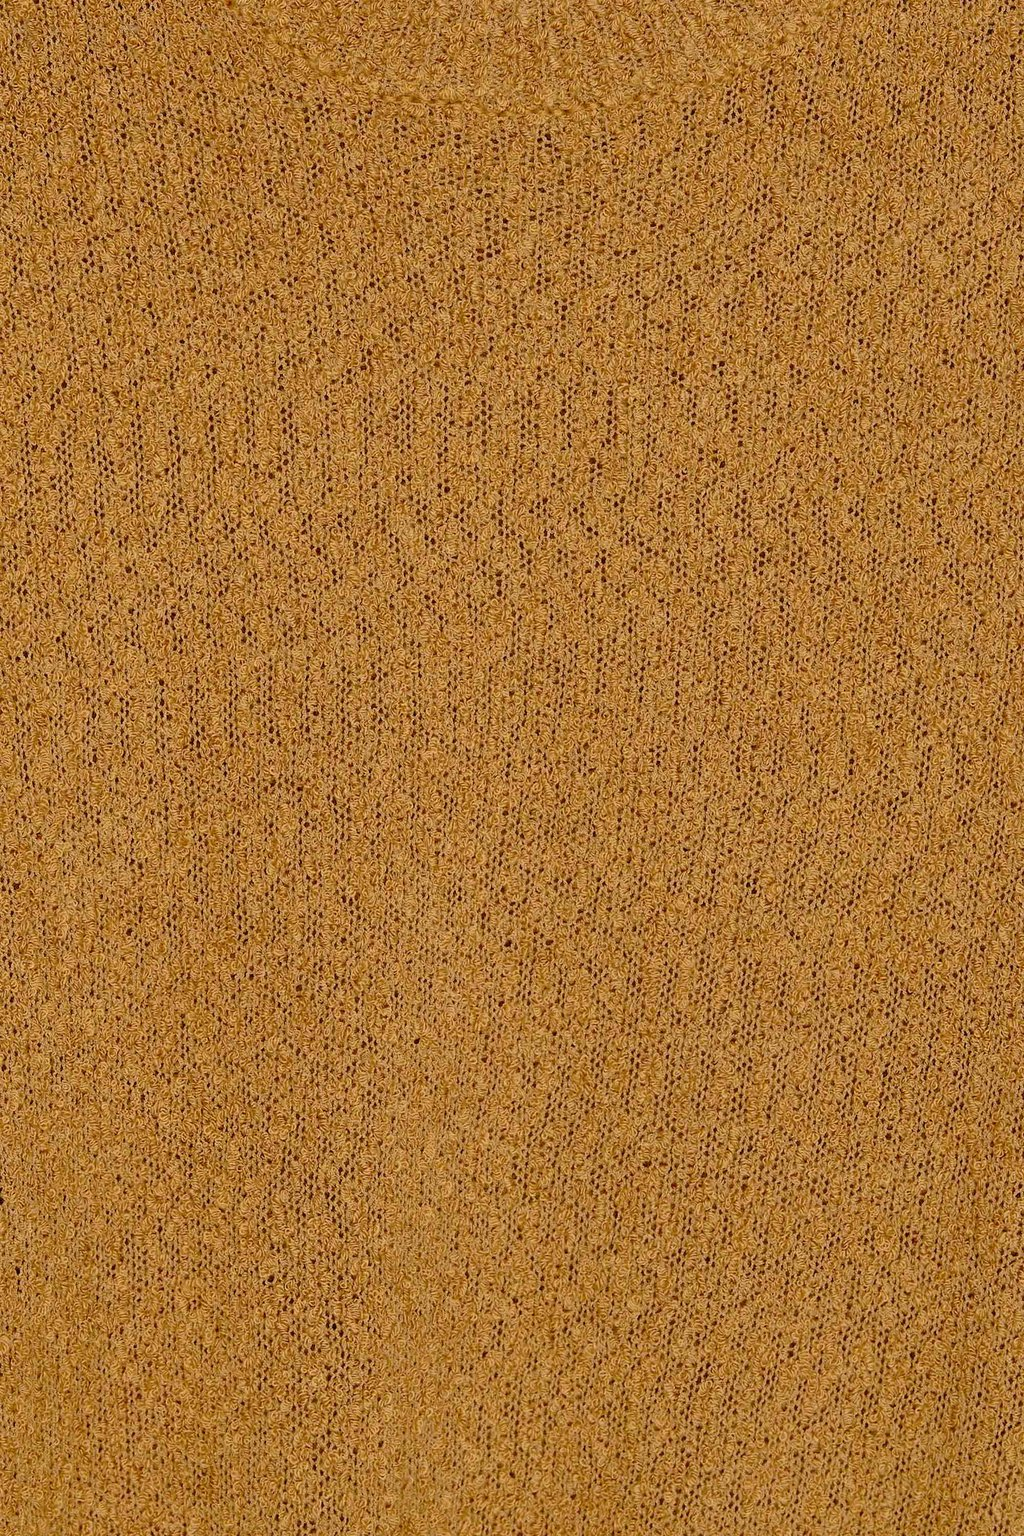 Sweater 3376 Mustard 6